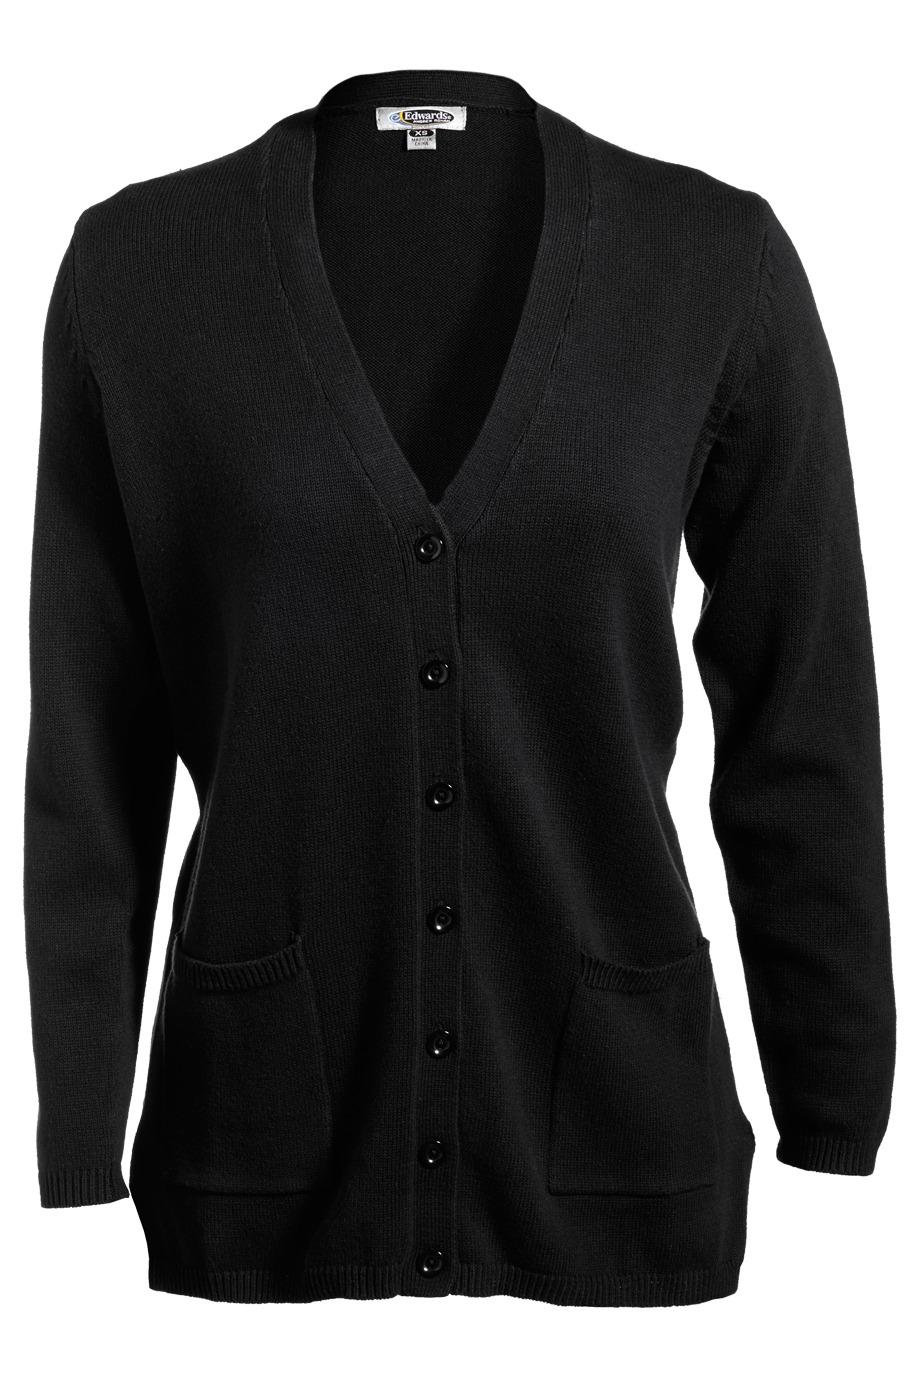 Edwards Garment 119 女士V字领长款开襟羊毛衫